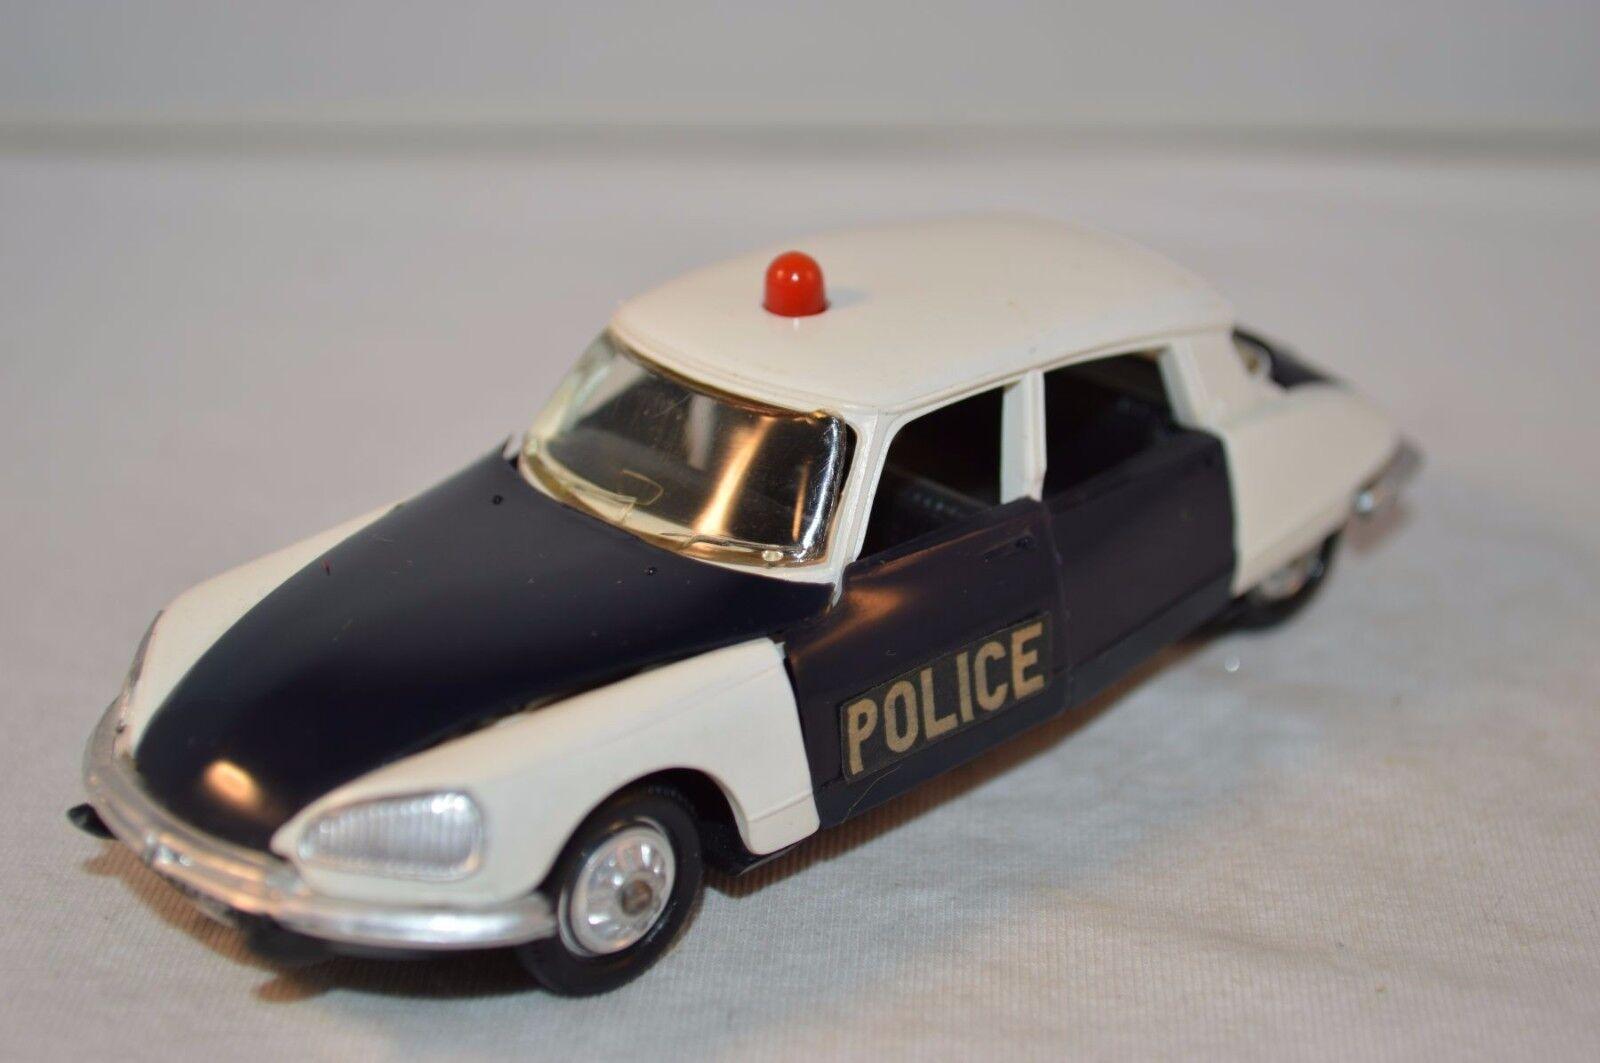 Norev 158 Citroen DS 21  Police  perfect mint all original condition súperB